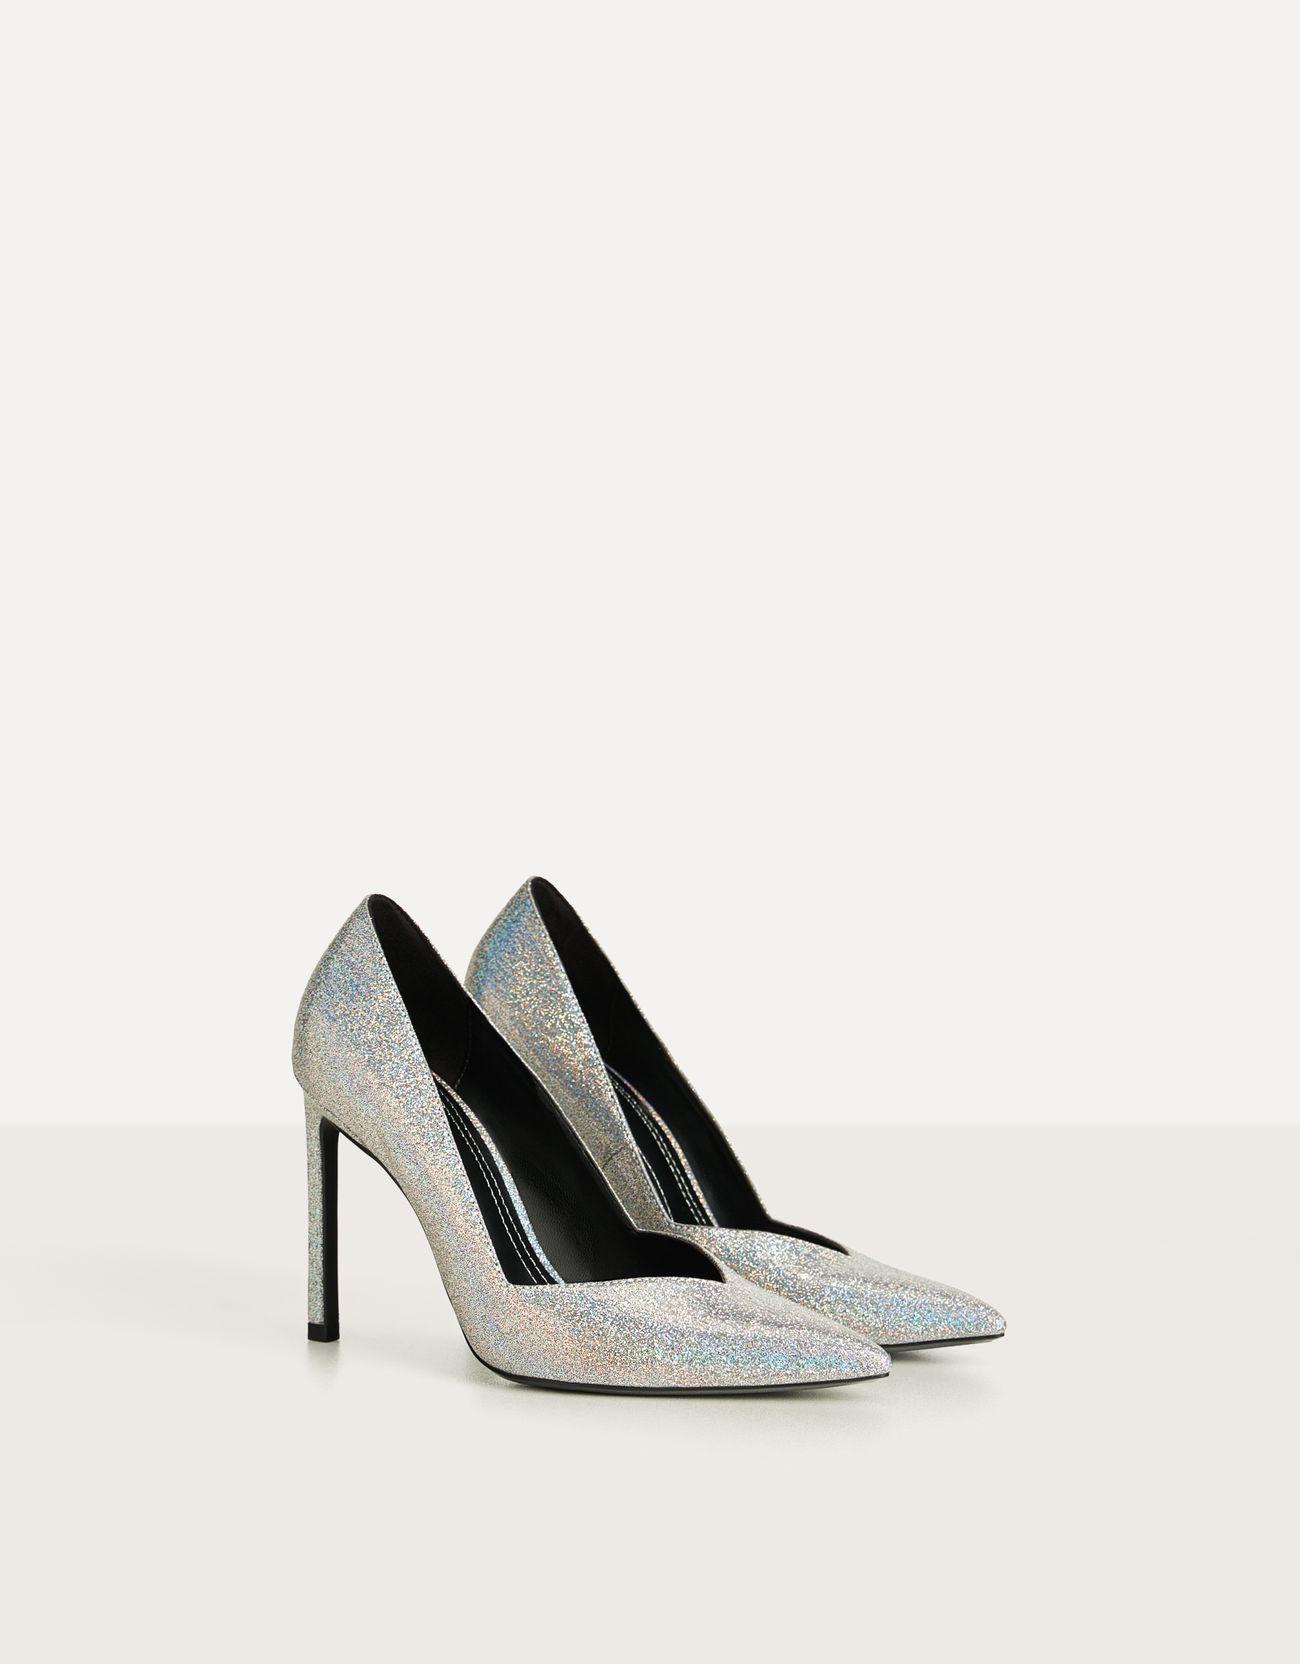 Glitter stiletto heels